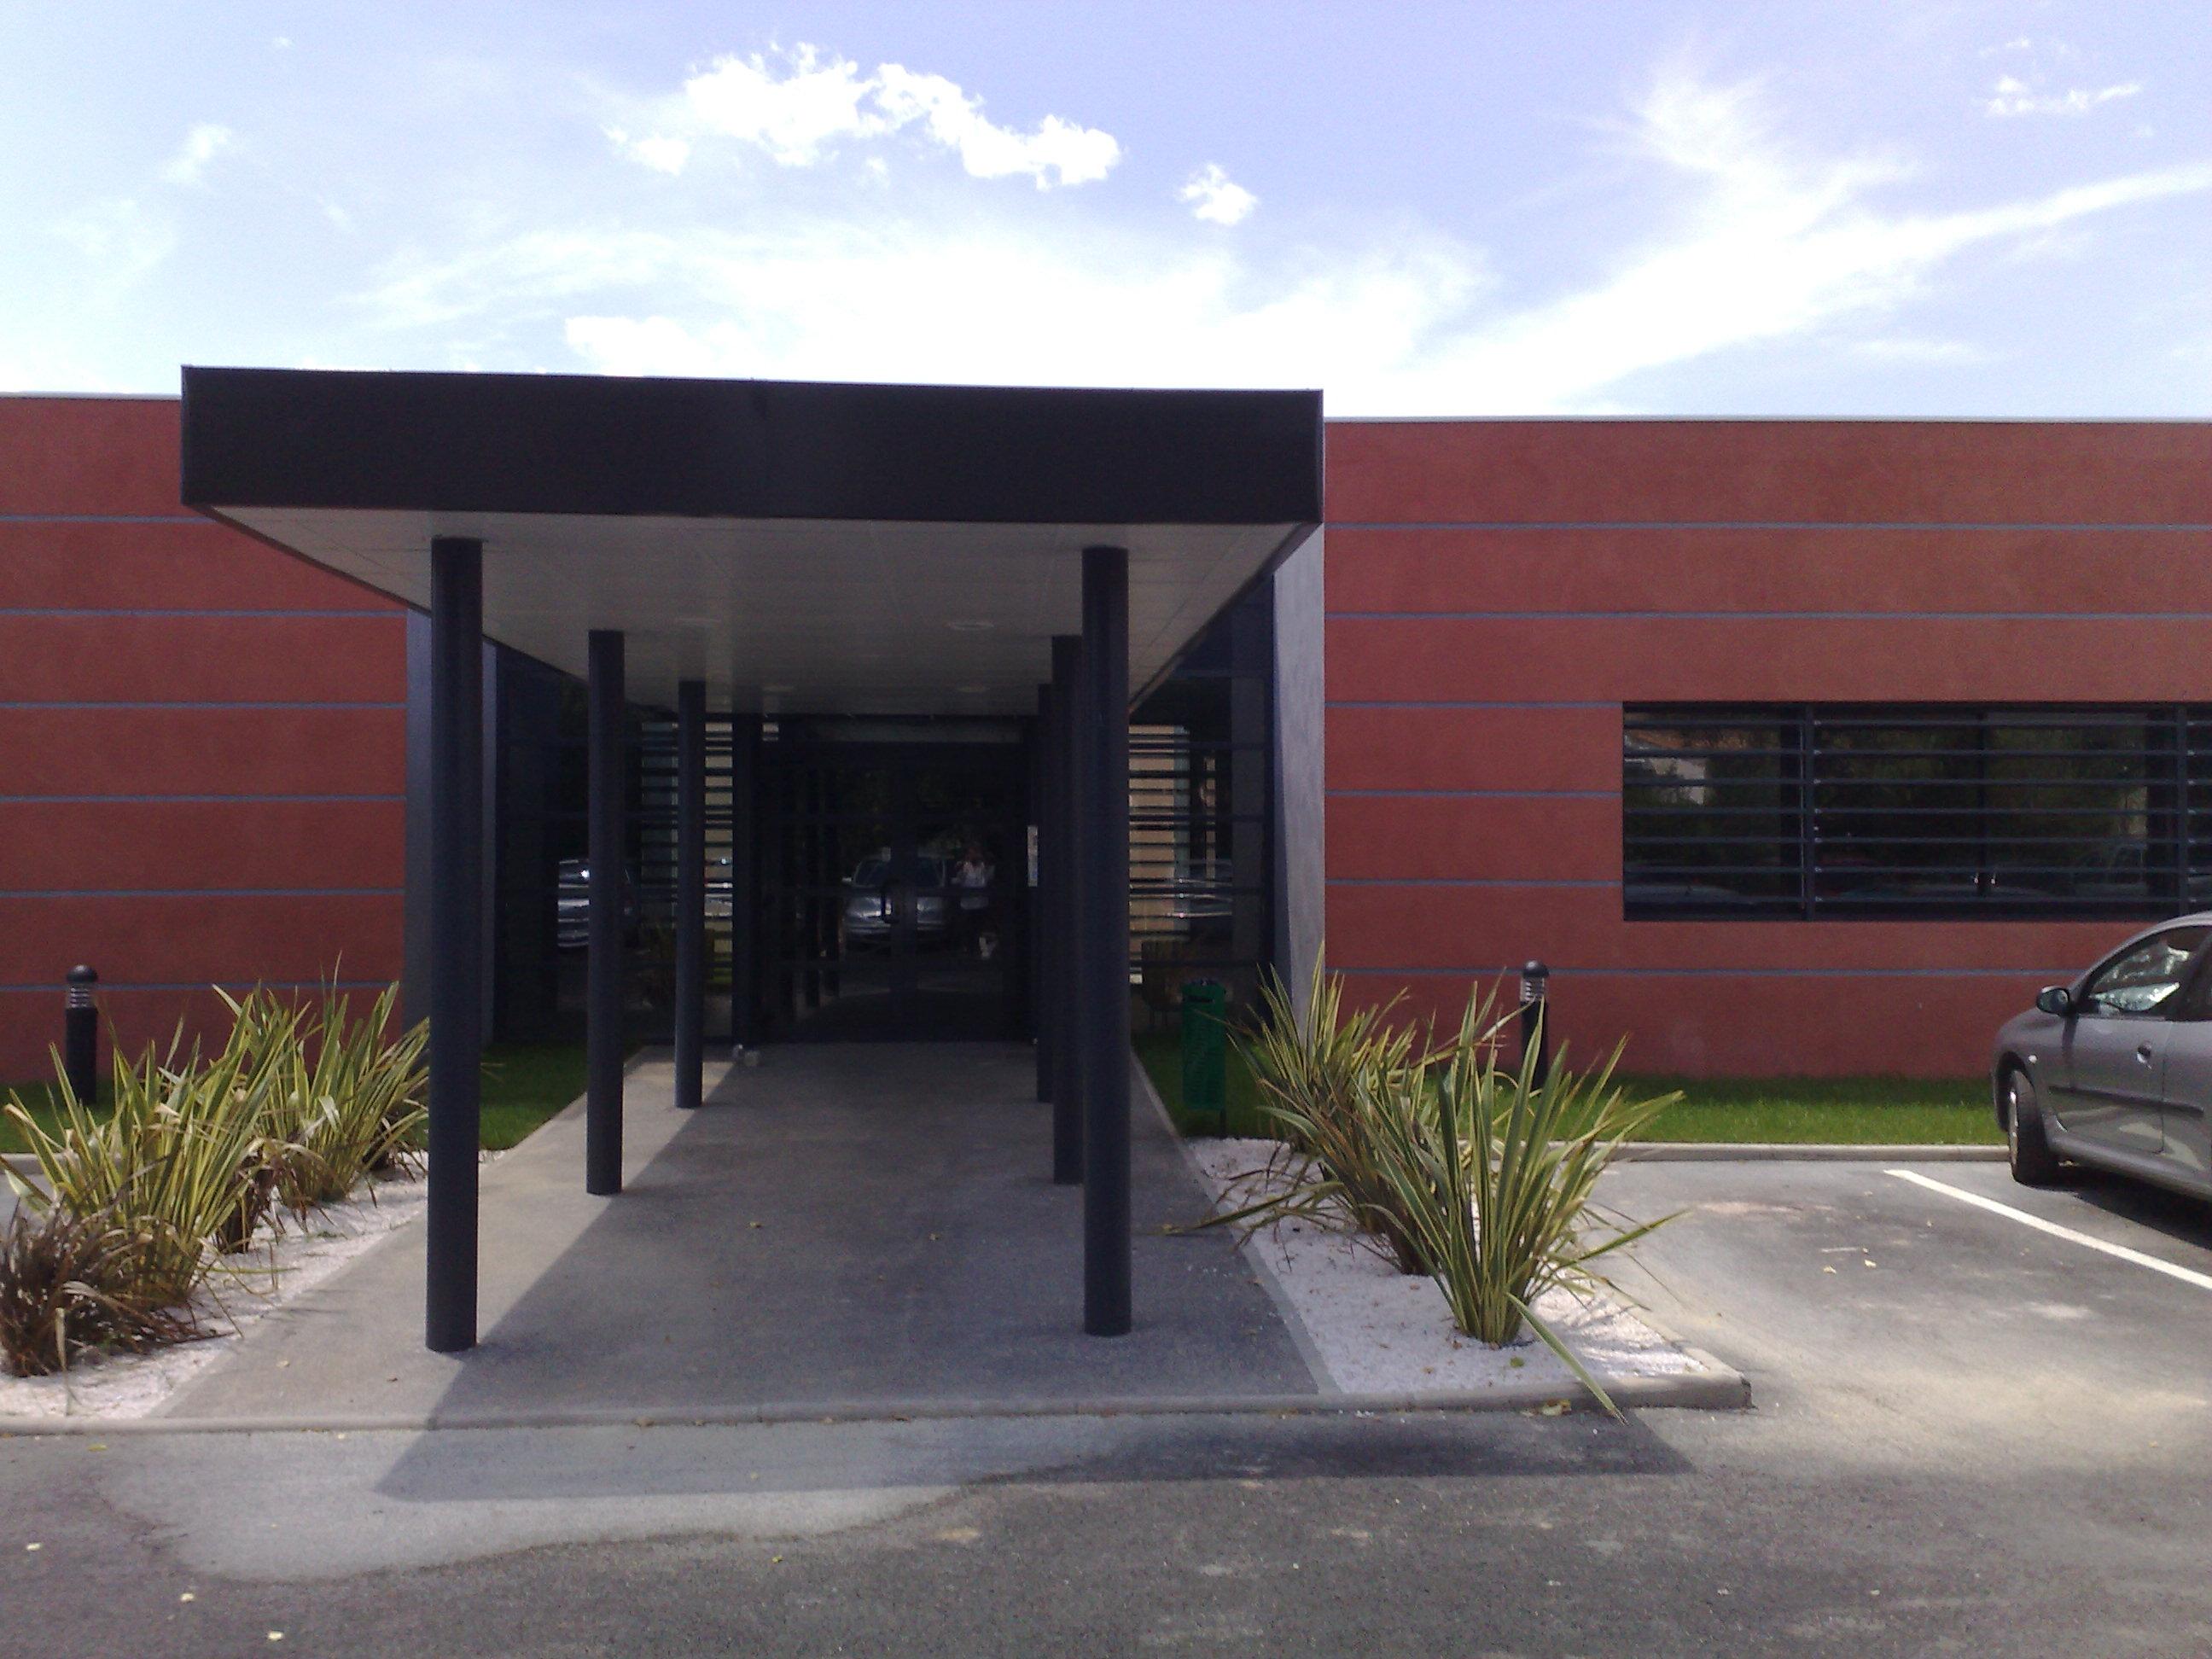 Extension du siège de l'Ametra